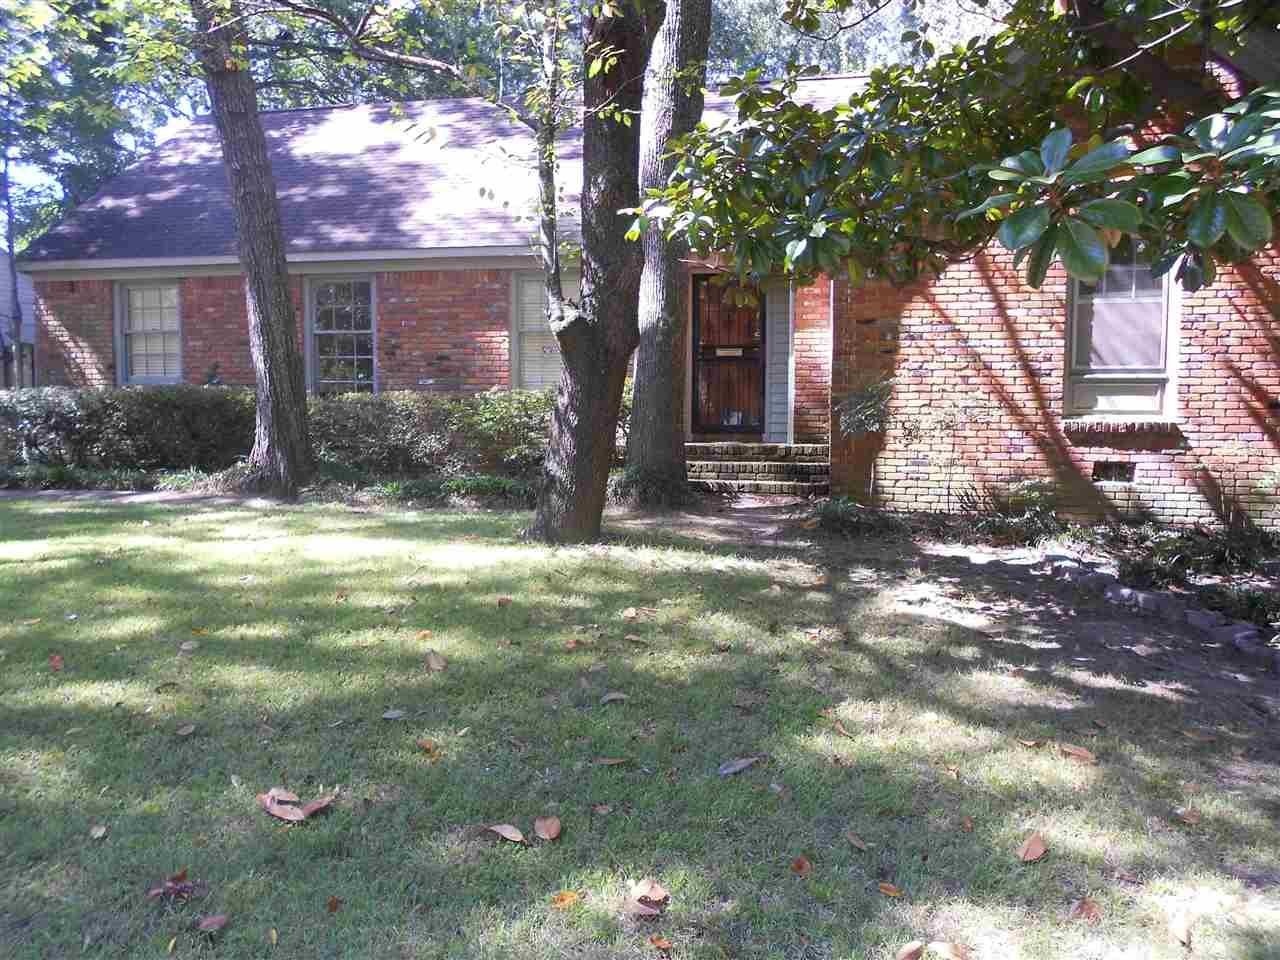 393 ELWOOD LN, Memphis, TN 38117